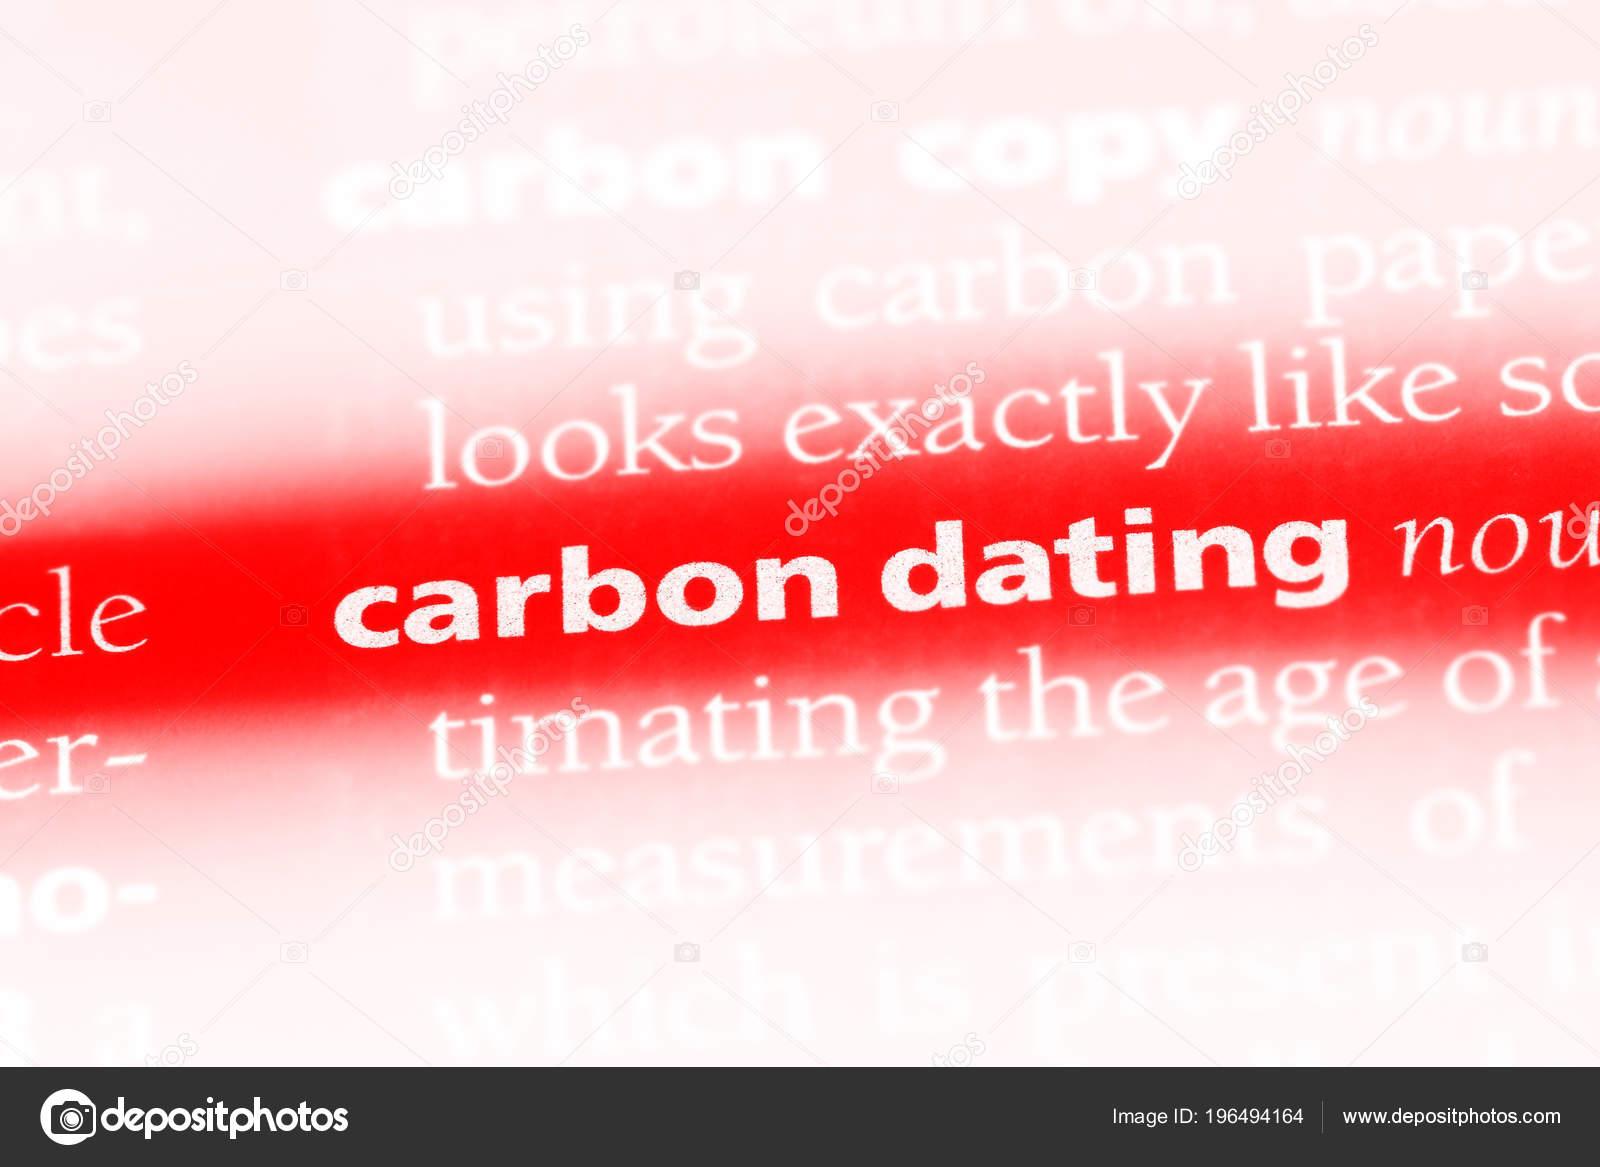 define carbon dating download mobile dating